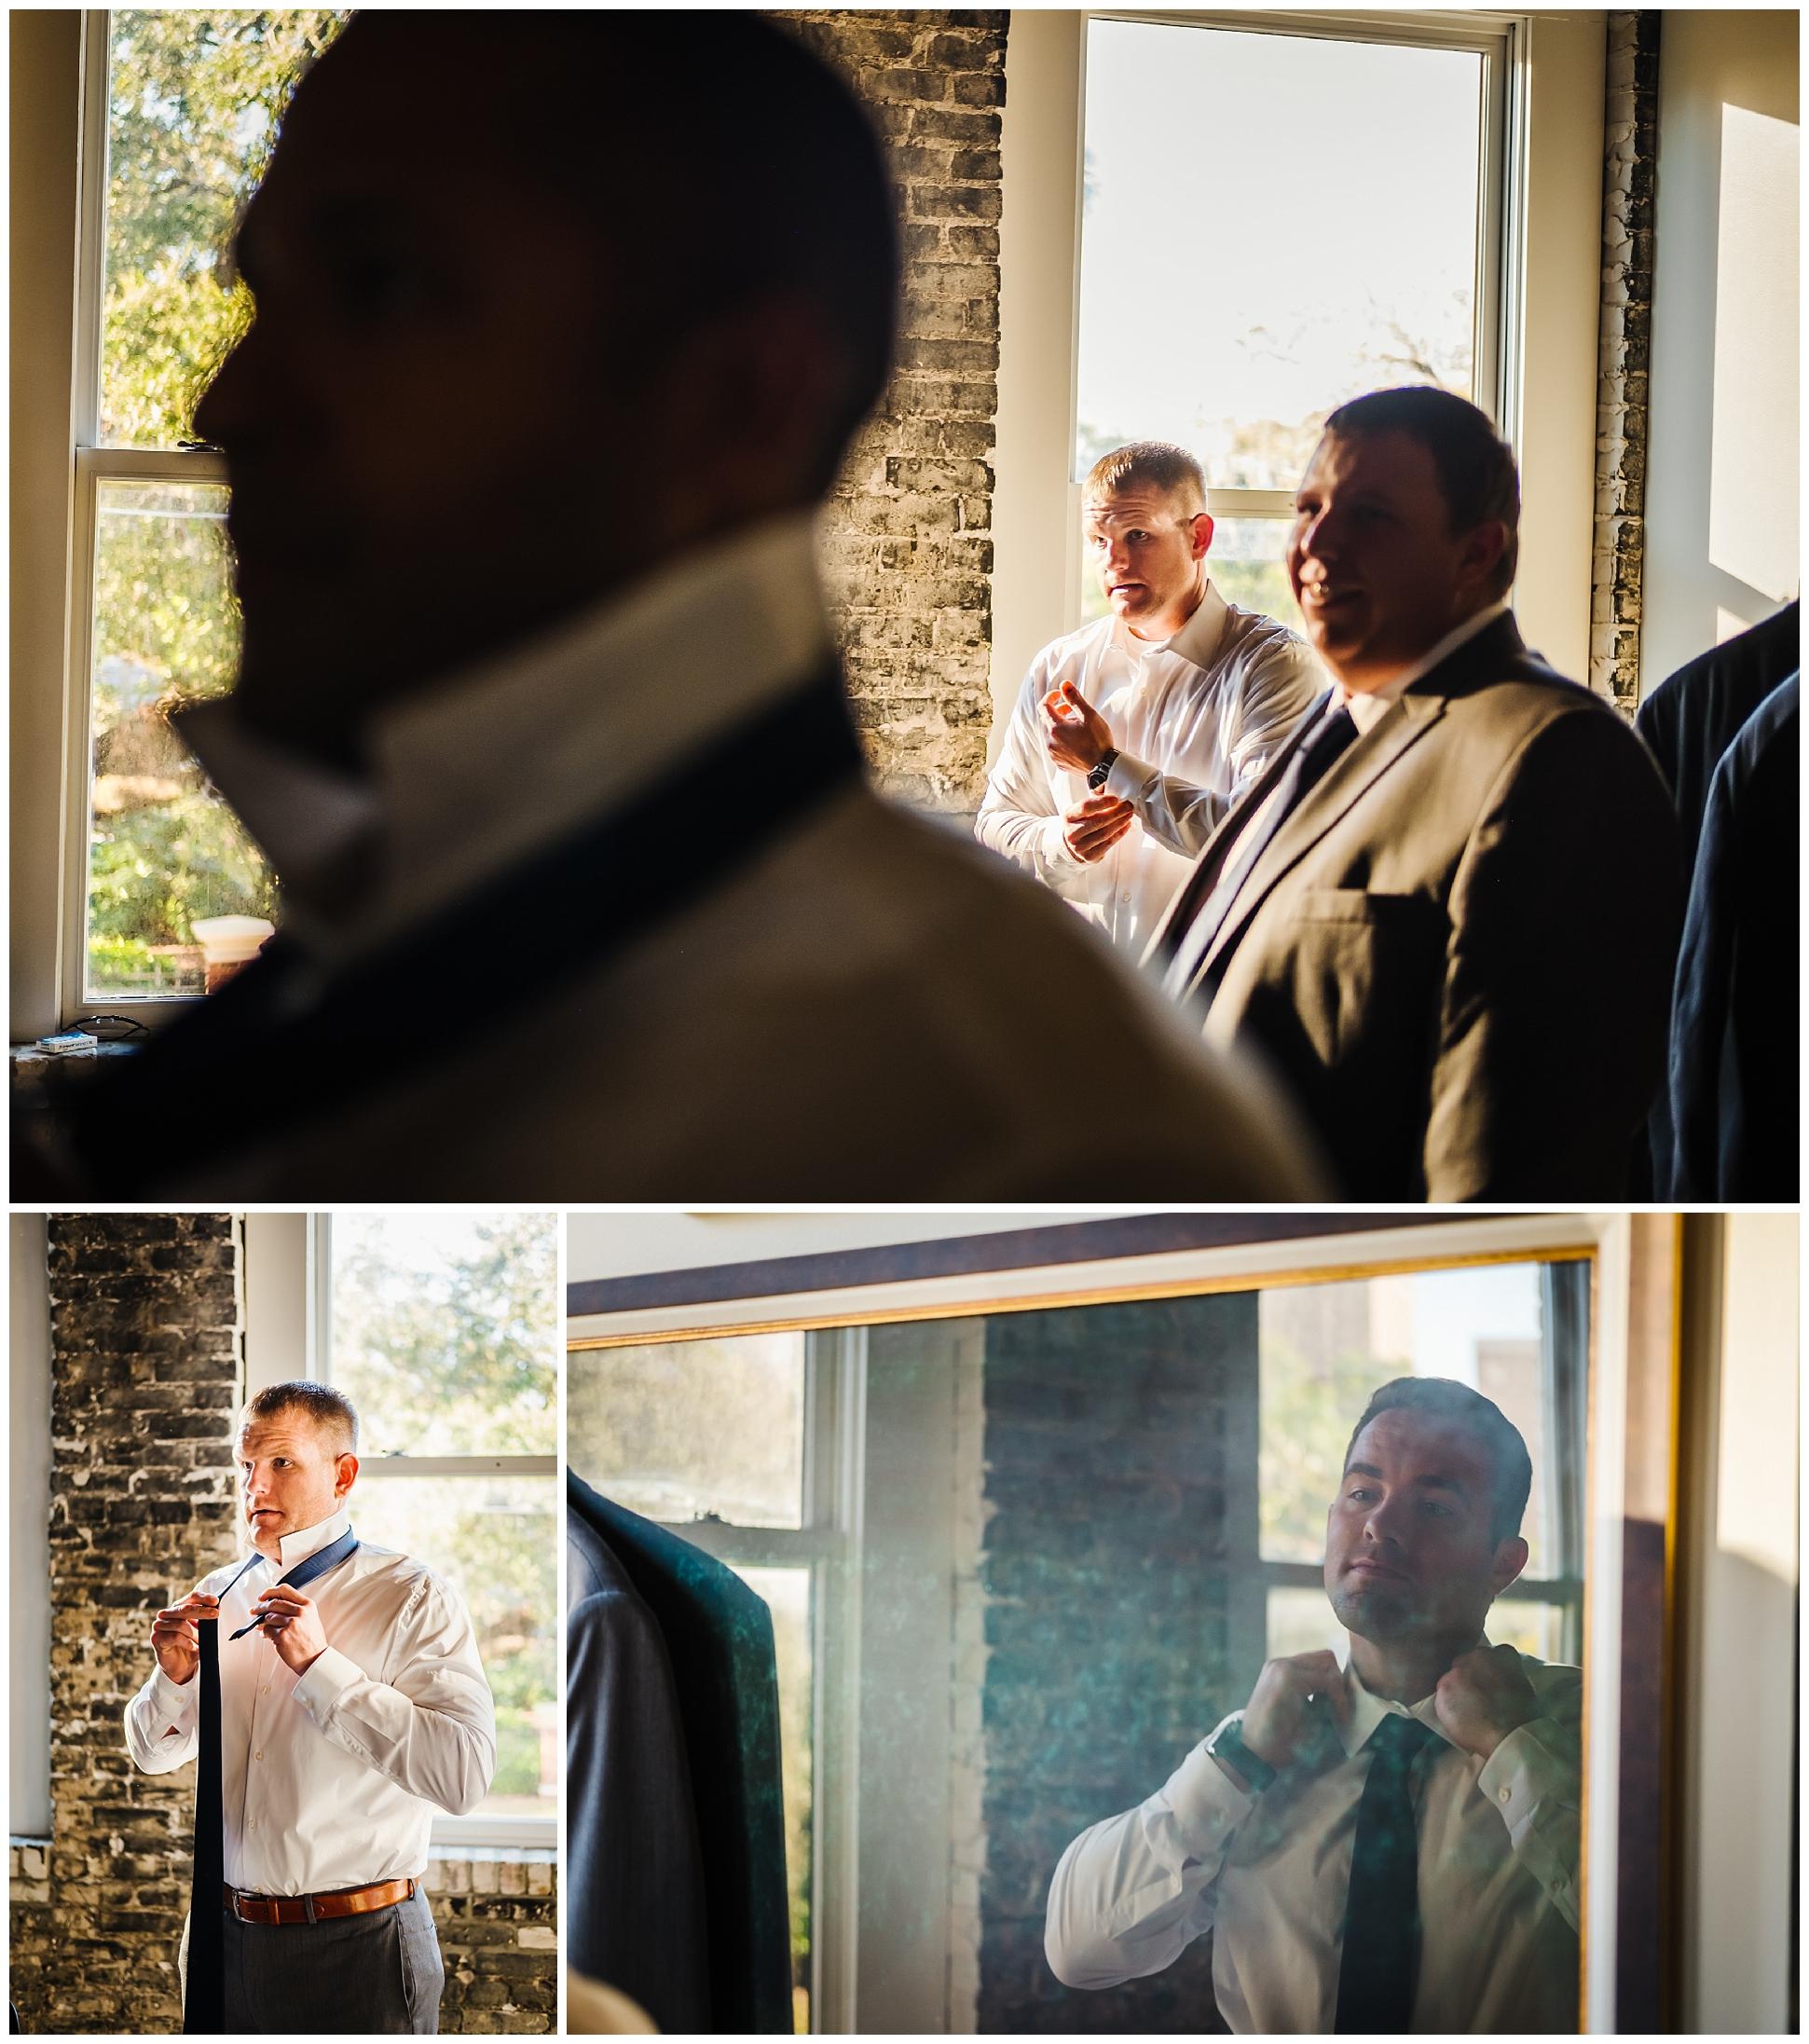 tampa-wedding-photographer-oxford-exchange-garland-candlelight-gold-hayley-paige_0018.jpg